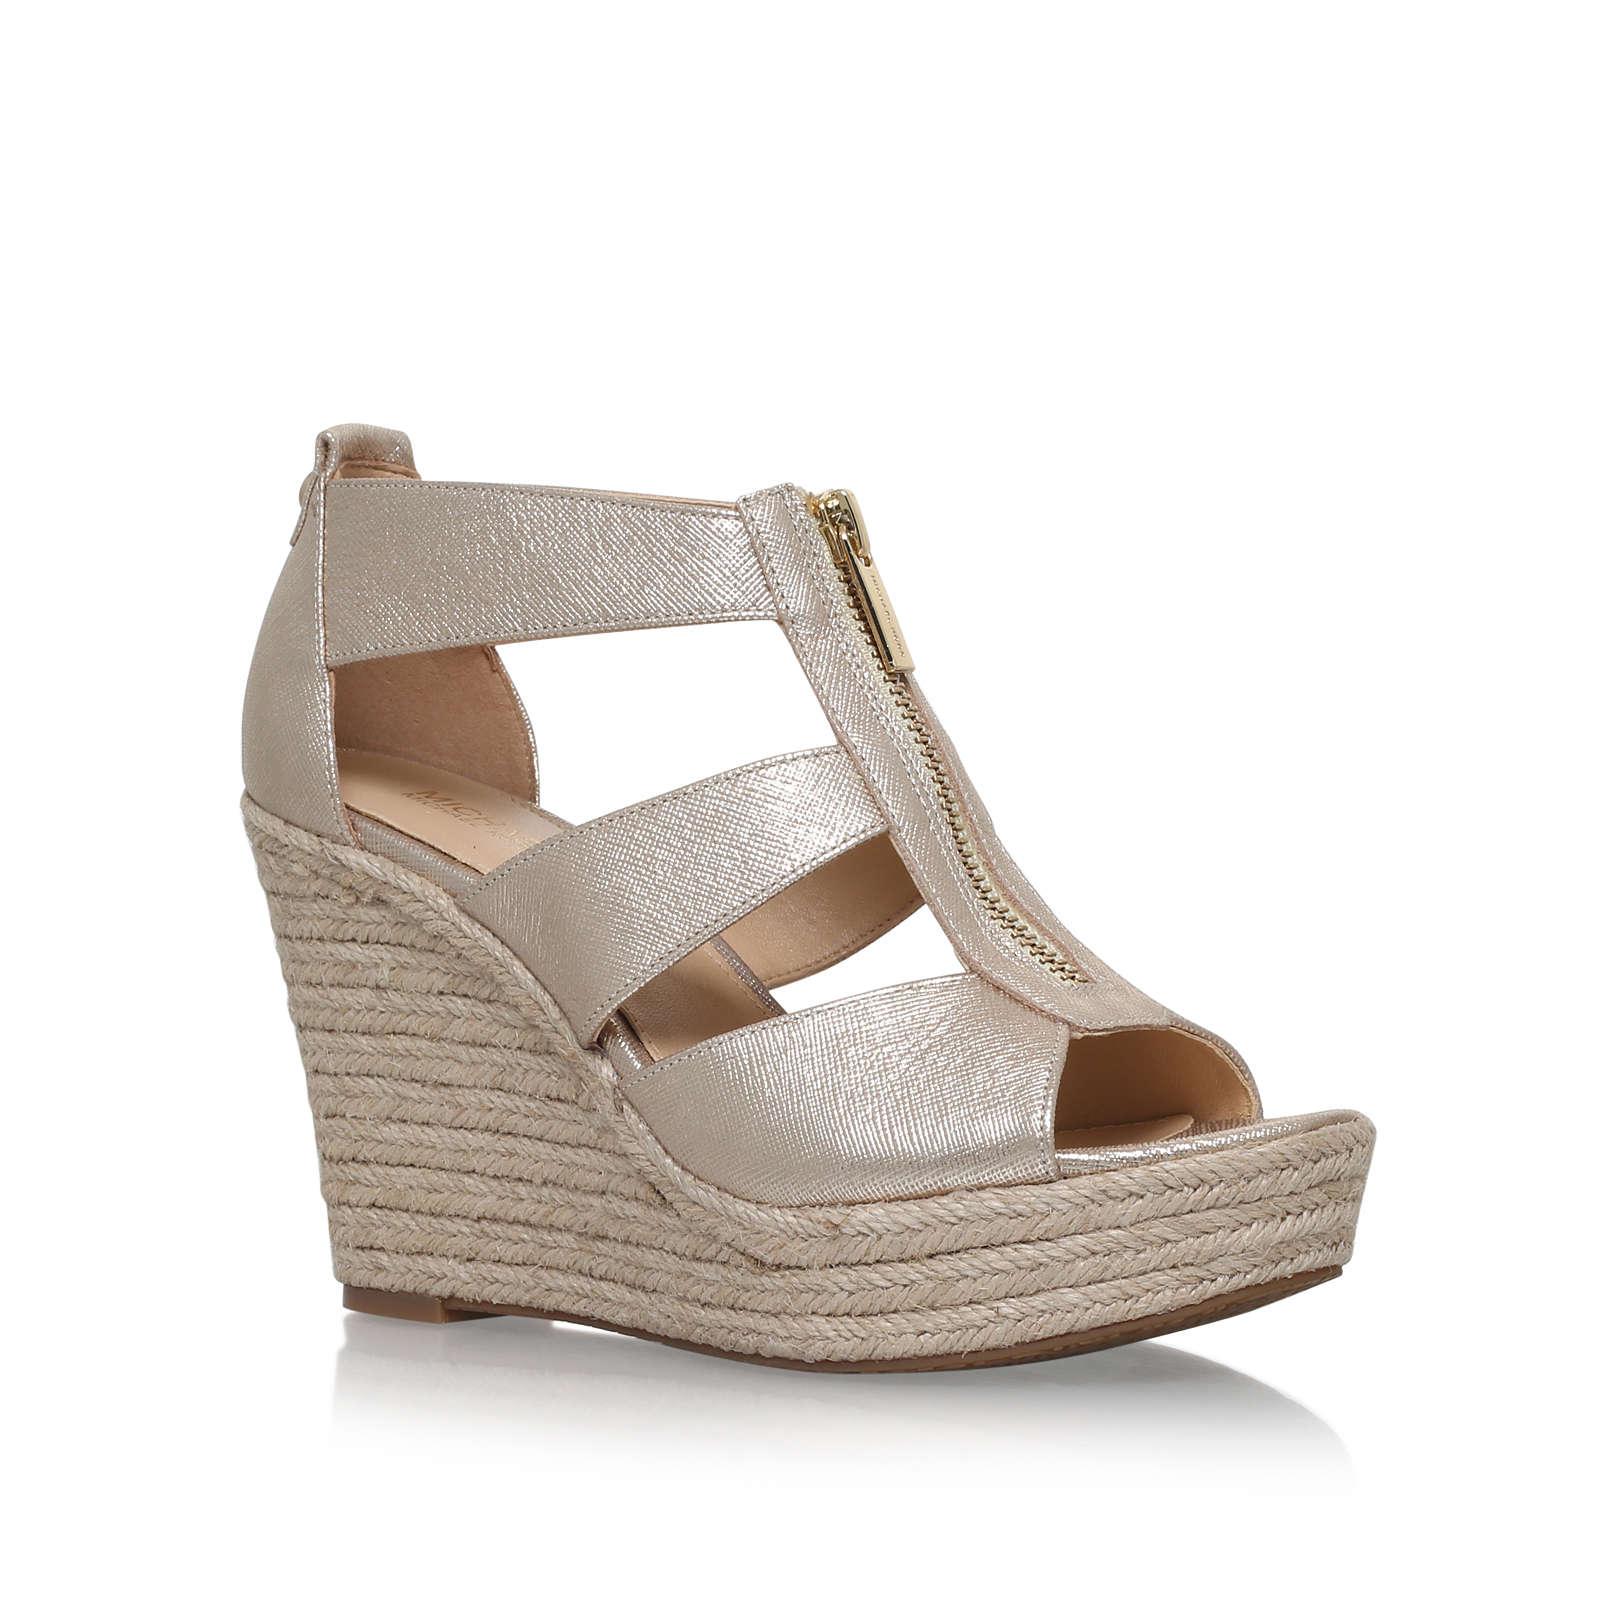 d8bbeaf9de54 DAMITA WEDGE Michael Michael Kors Damita Gold High Heel Sandals by MICHAEL  MICHAEL KORS